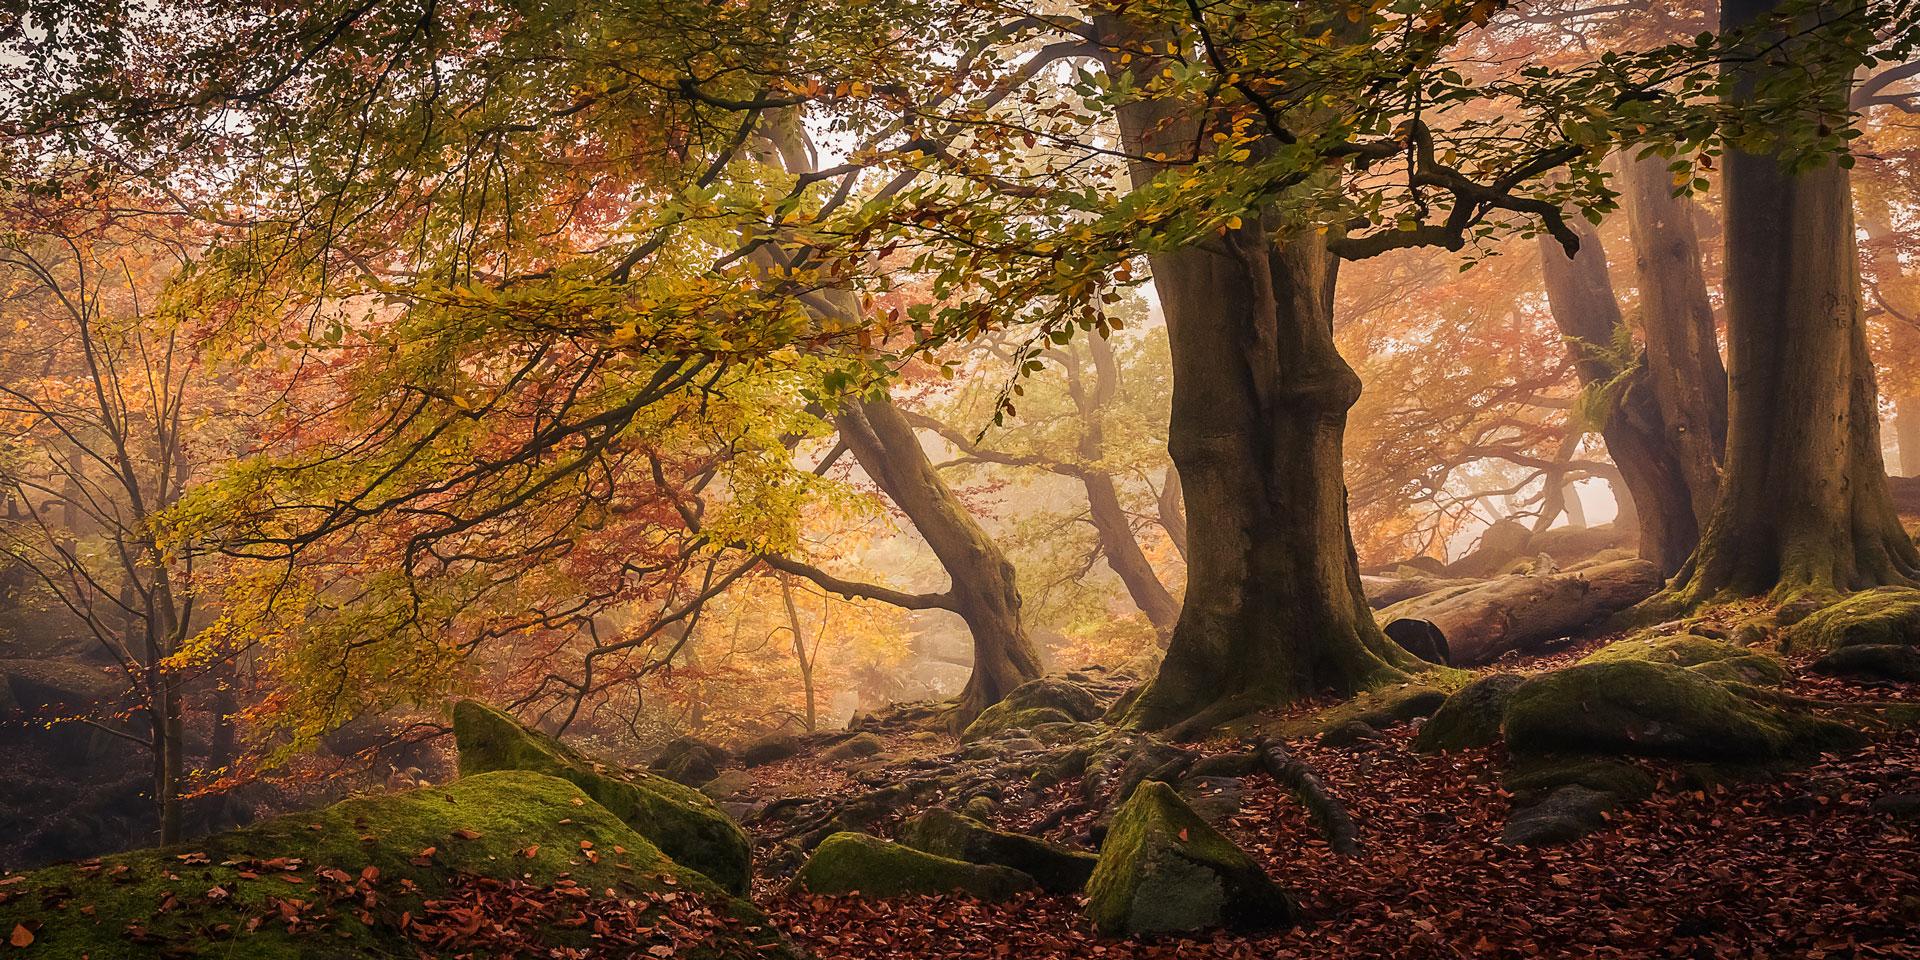 Padley trees